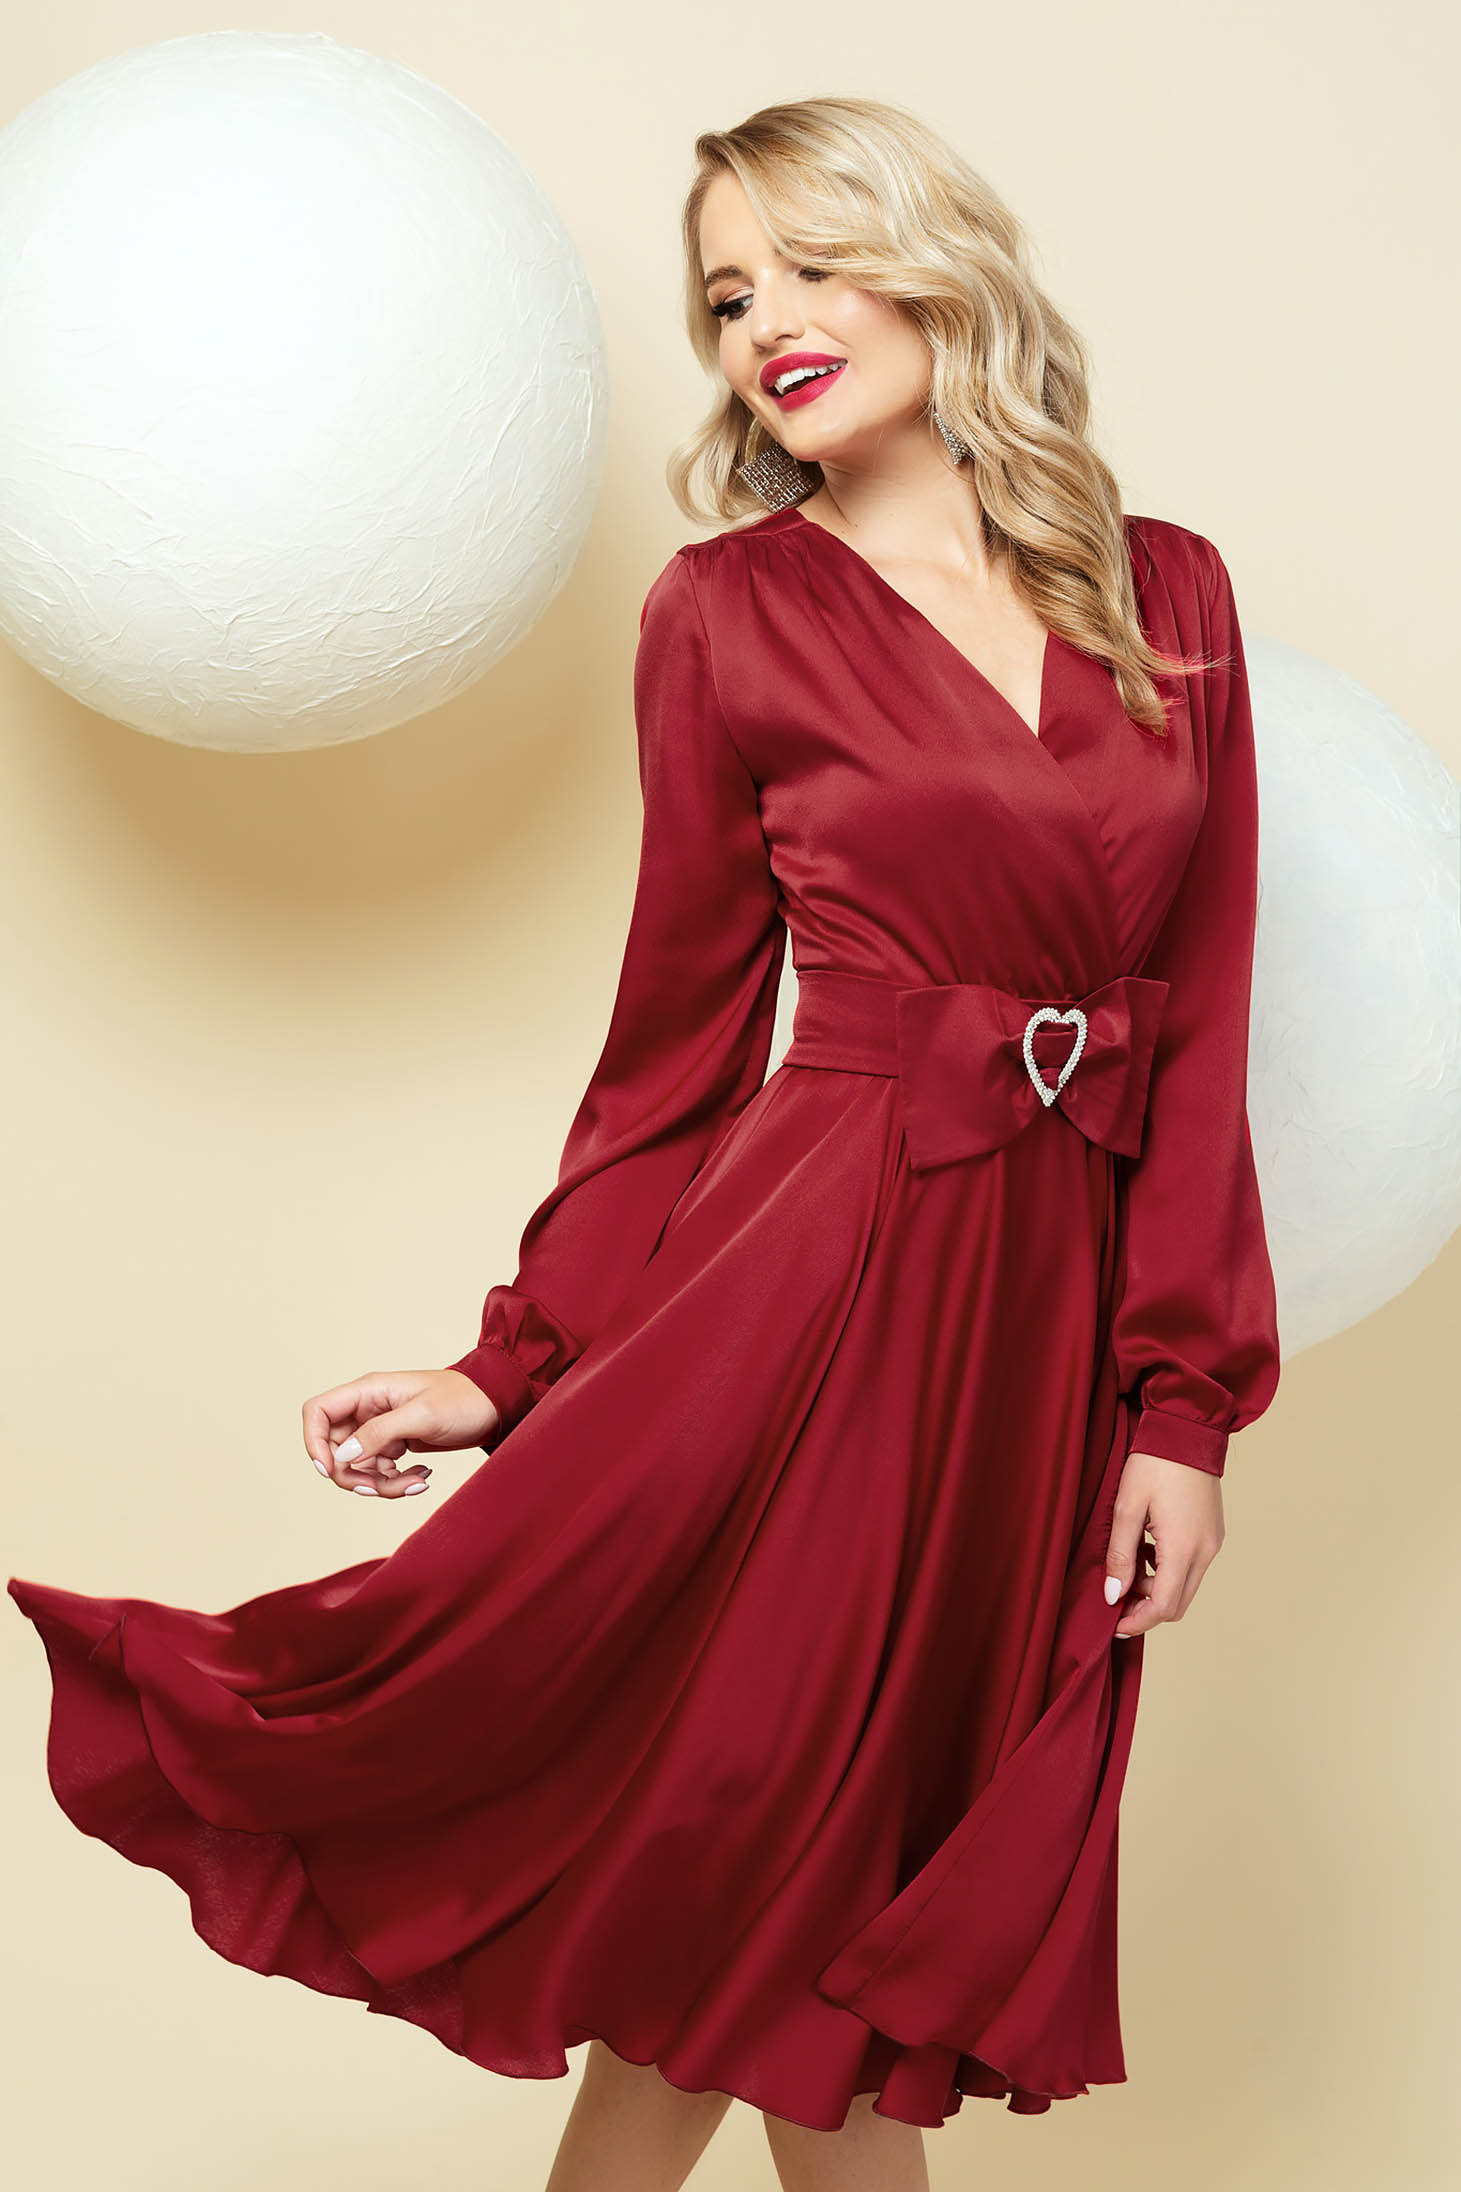 Rochii de Revelion Modele Deosebite Online